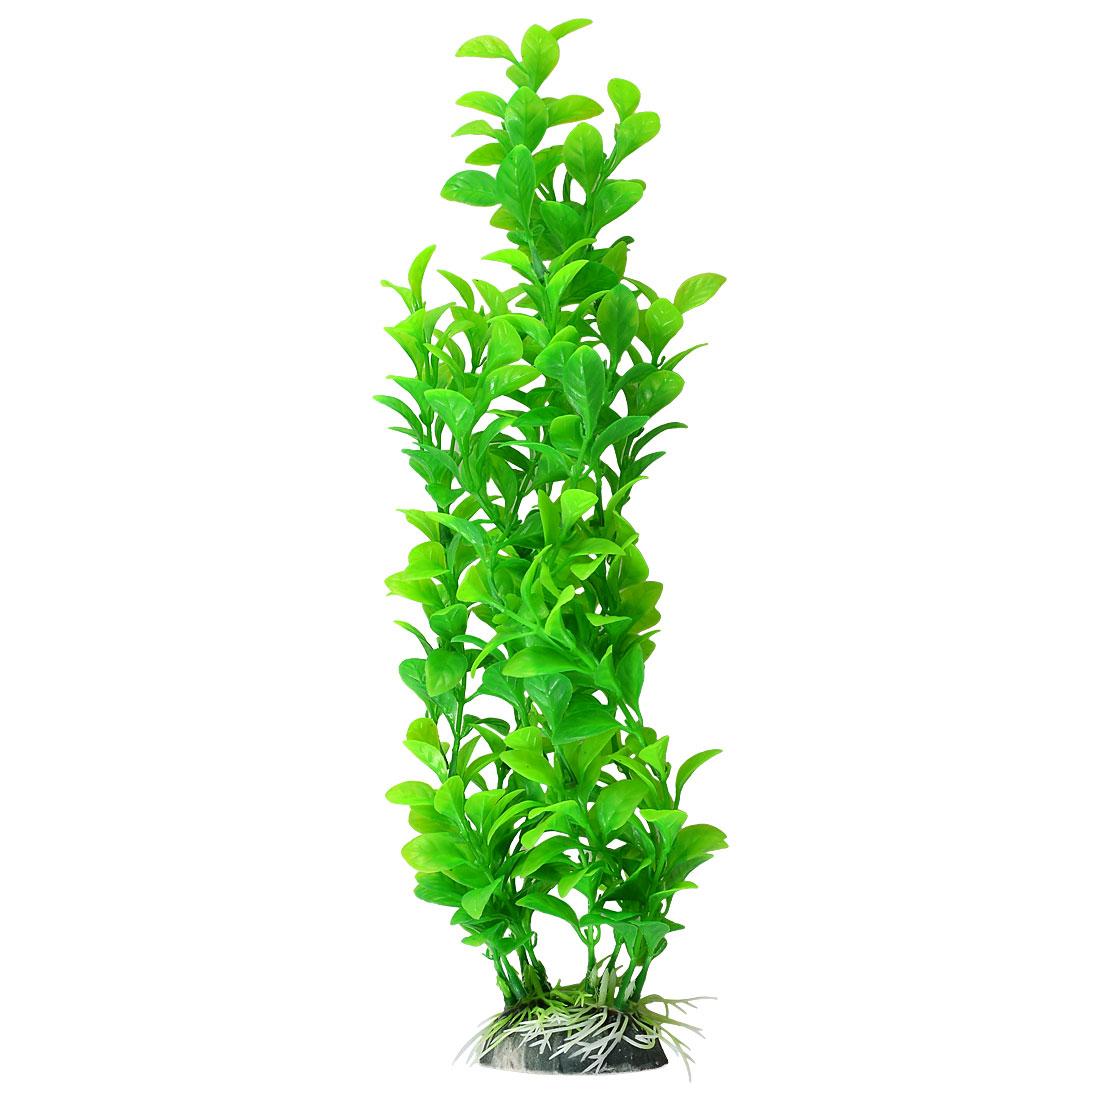 Decorative Artificial Plastic Green Leaves Aquarium Water Plants for Fish Tank